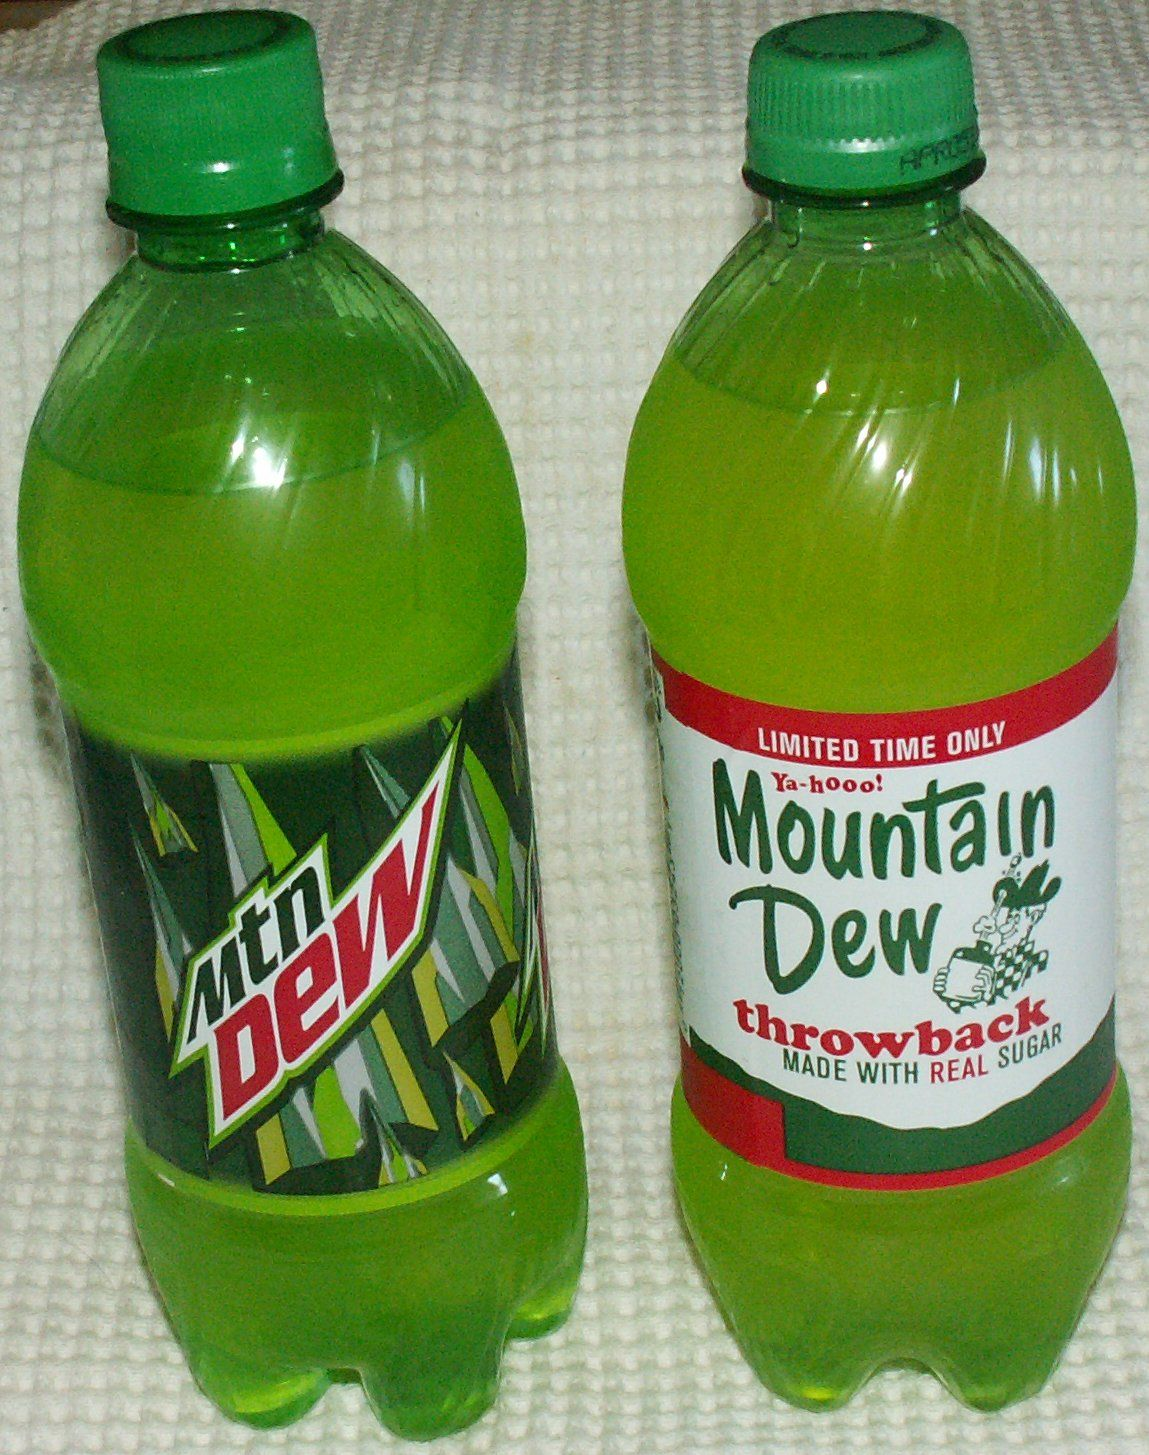 Mountain Dew Throwback Mountain Dew Food Should Taste Good Pop Bottles